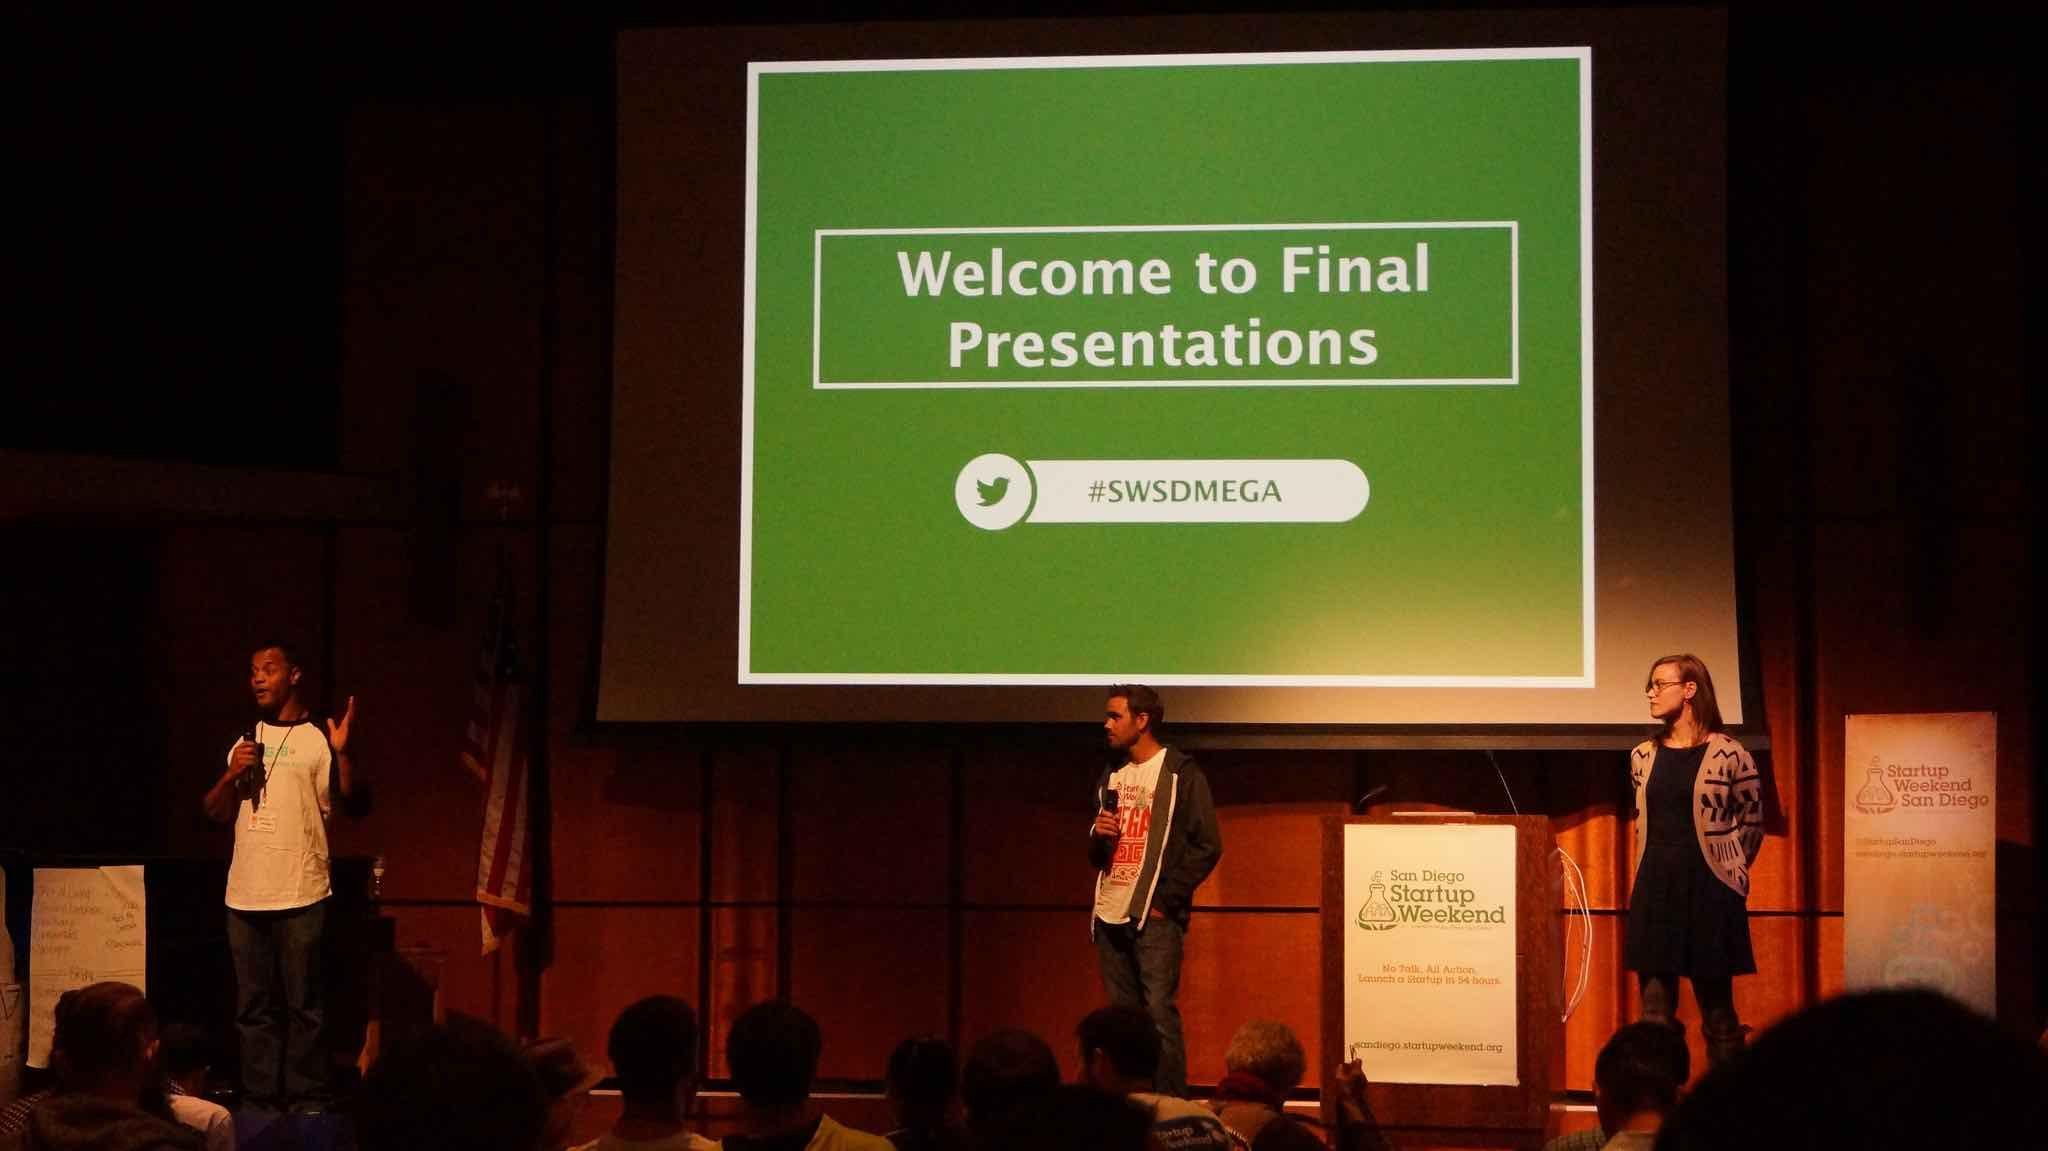 Startup Weekend final presentations